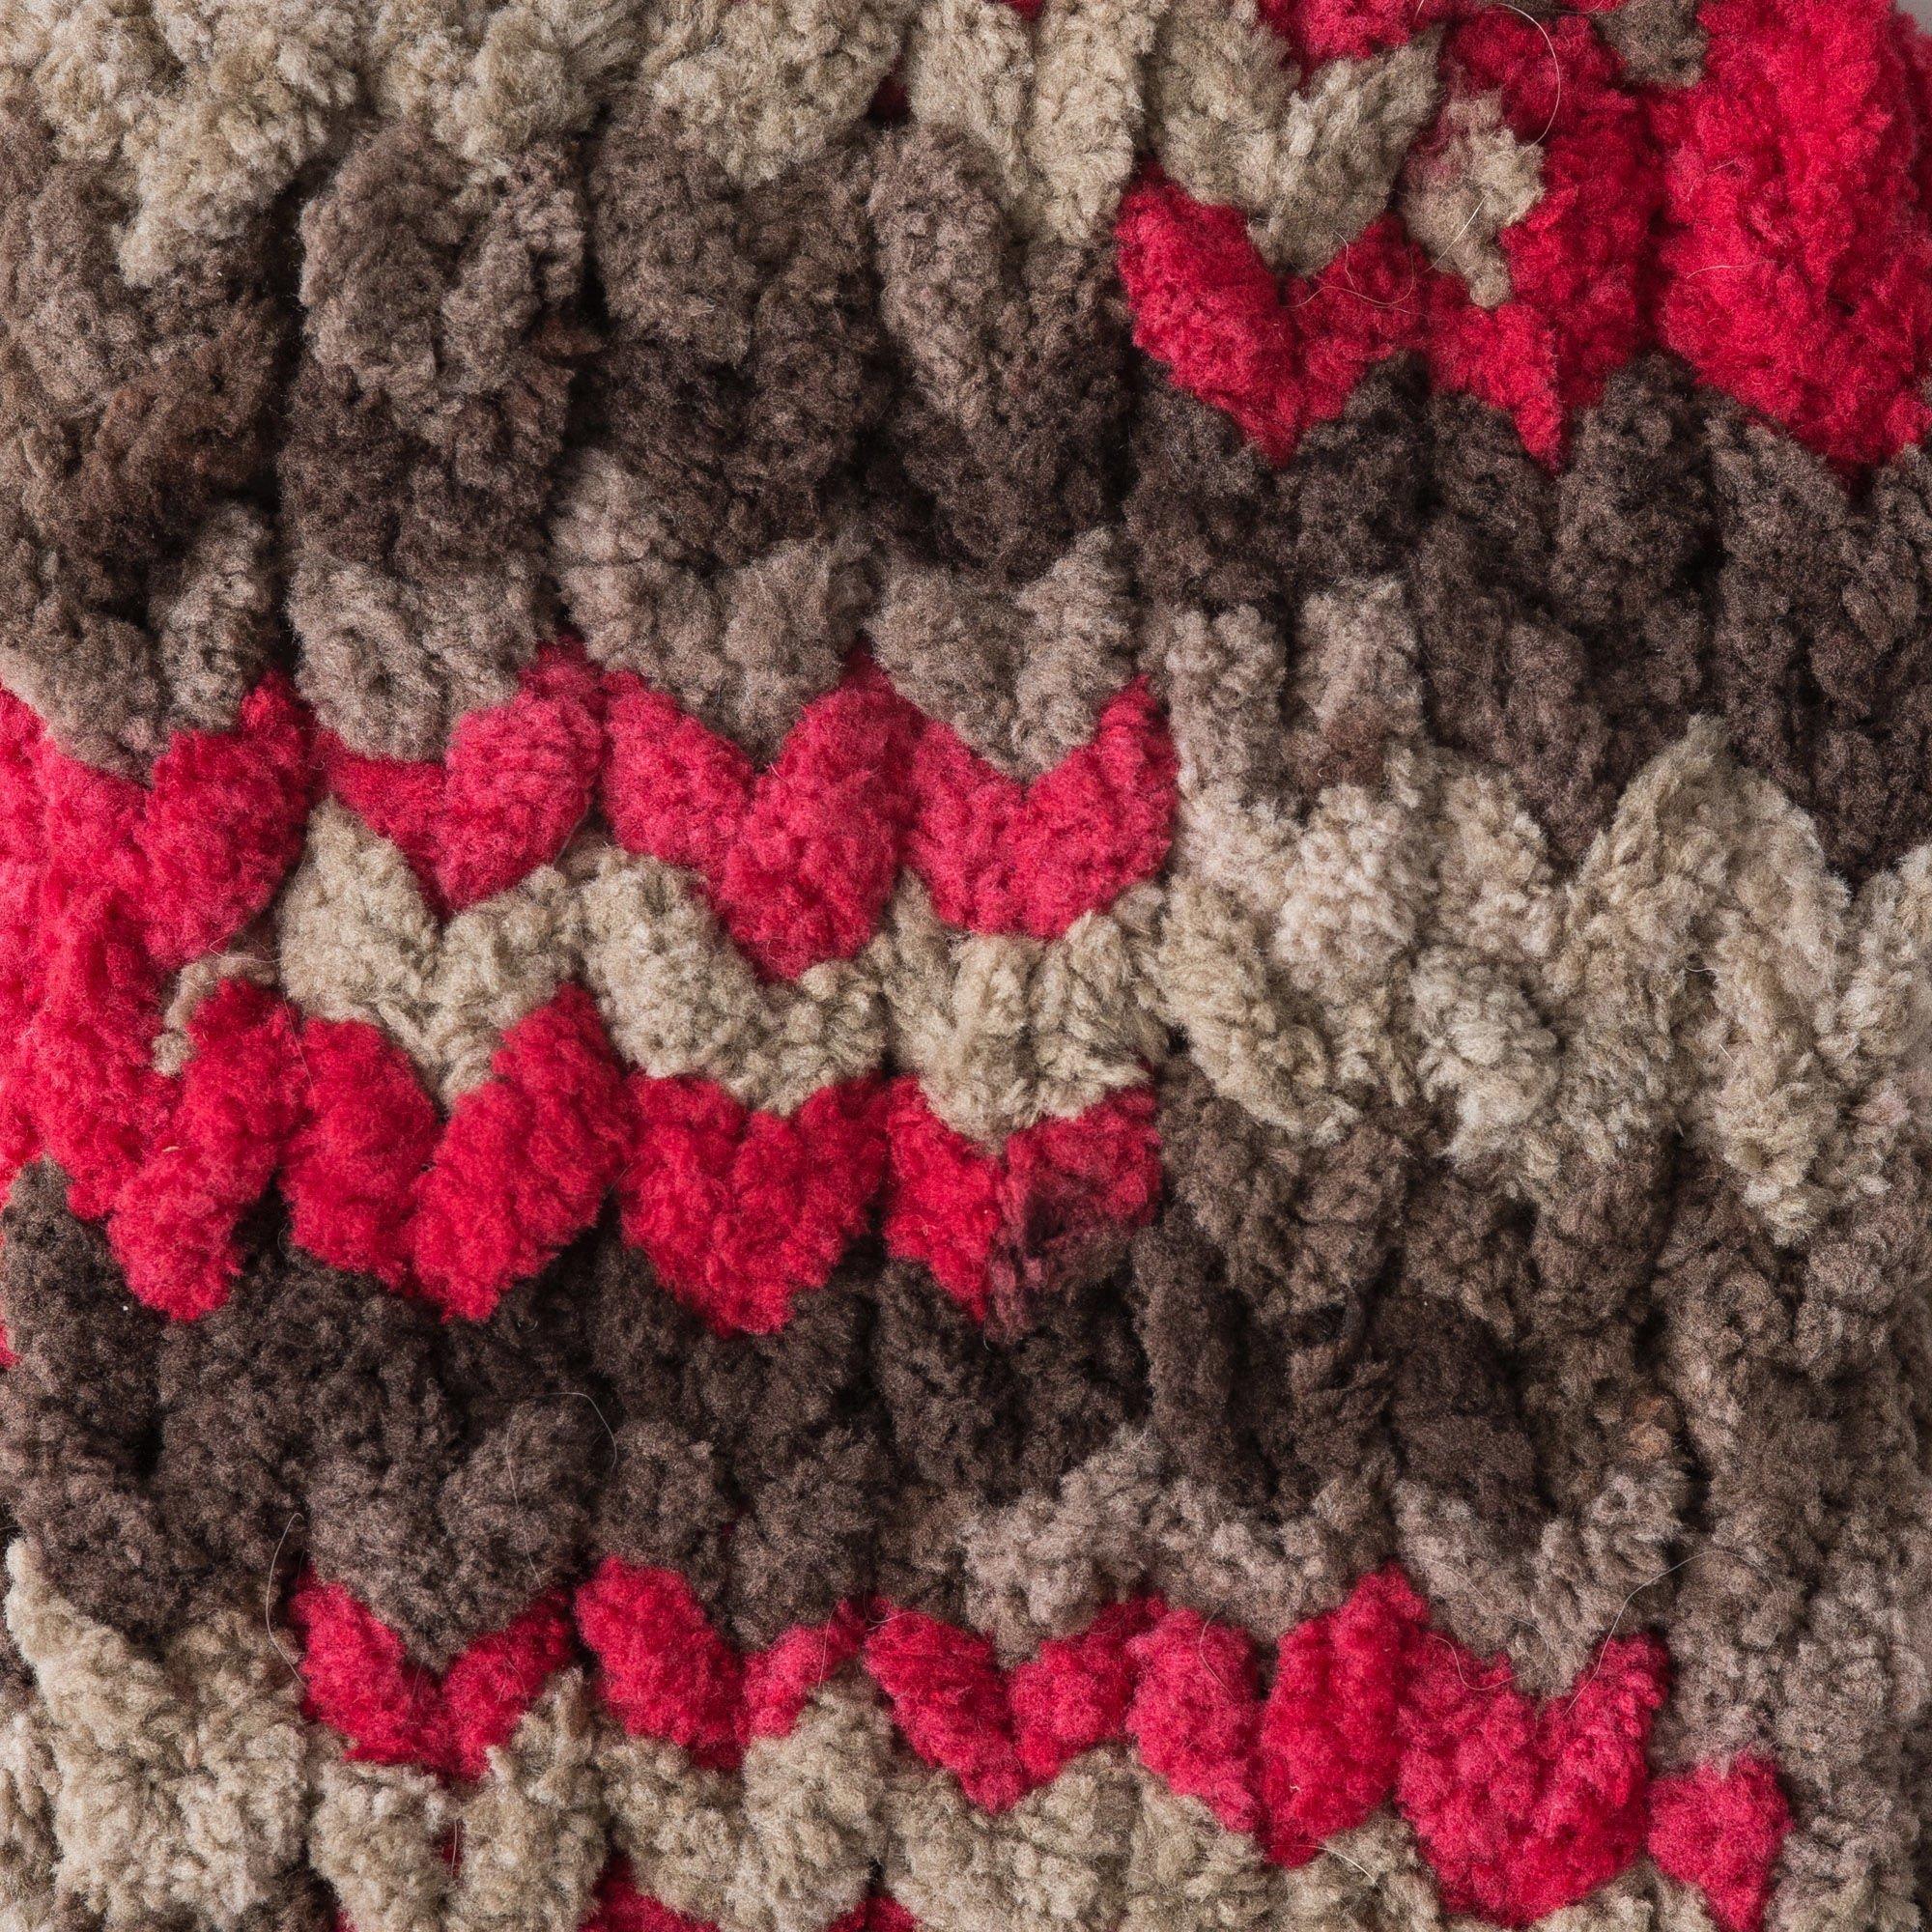 Bernat Blanket Yarn (5.3 oz) - 6 Pack Bundle with 3 Patterns - Raspberry Trifle